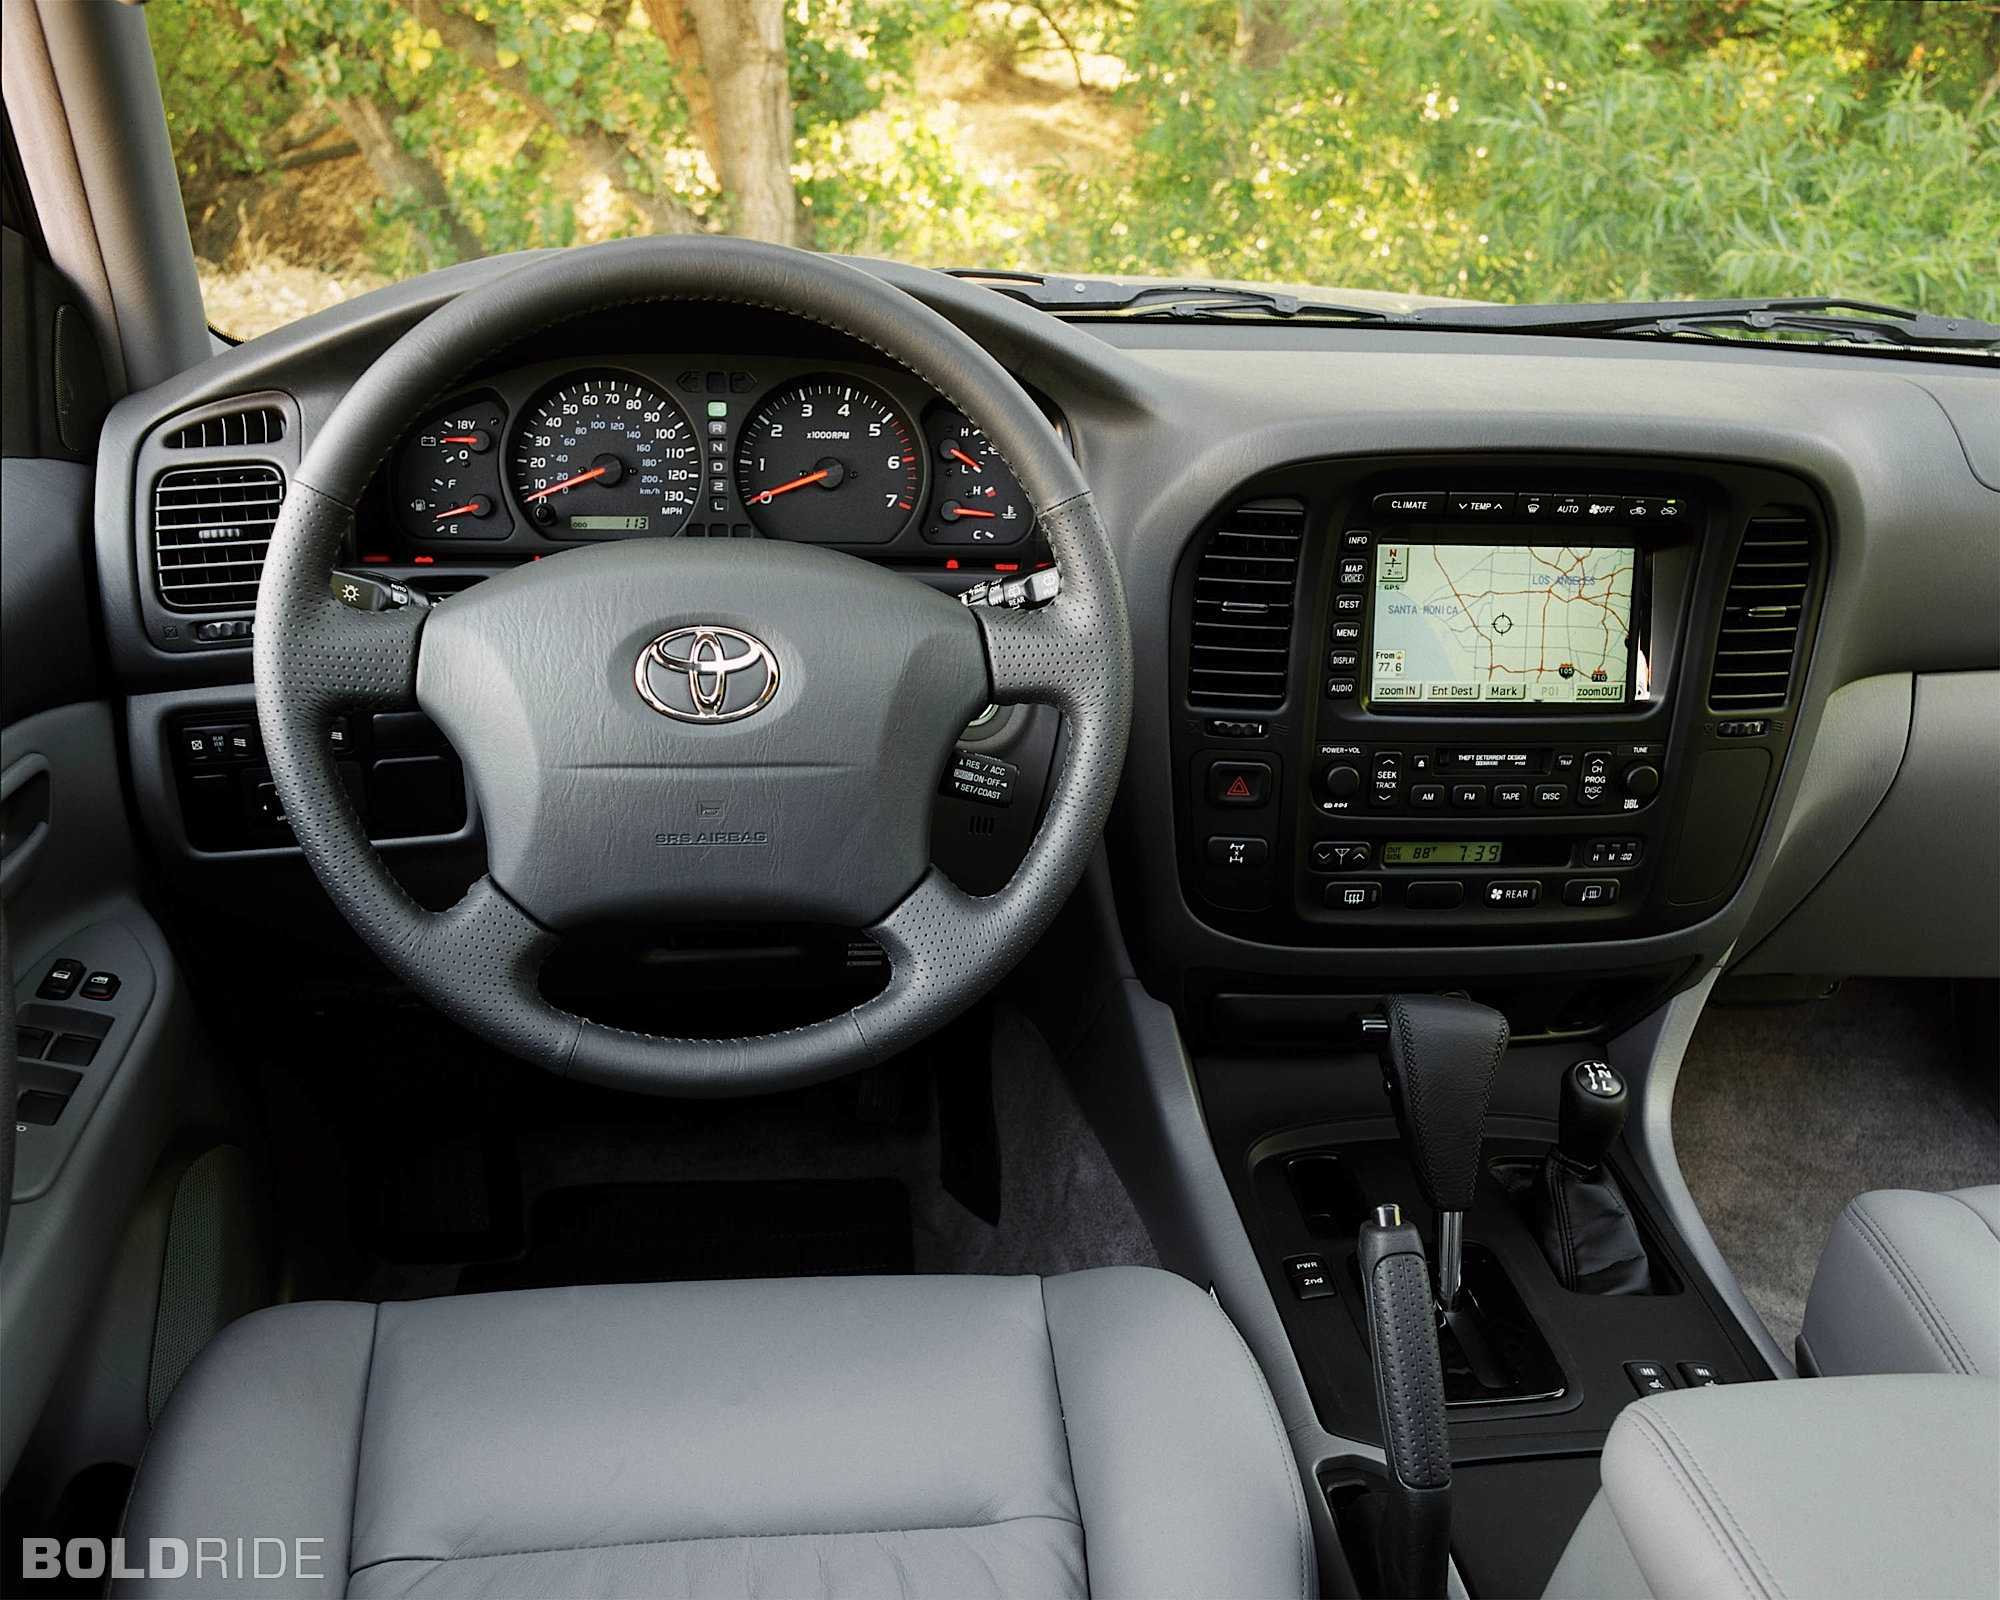 2000 Toyota Land Cruiser Image 4